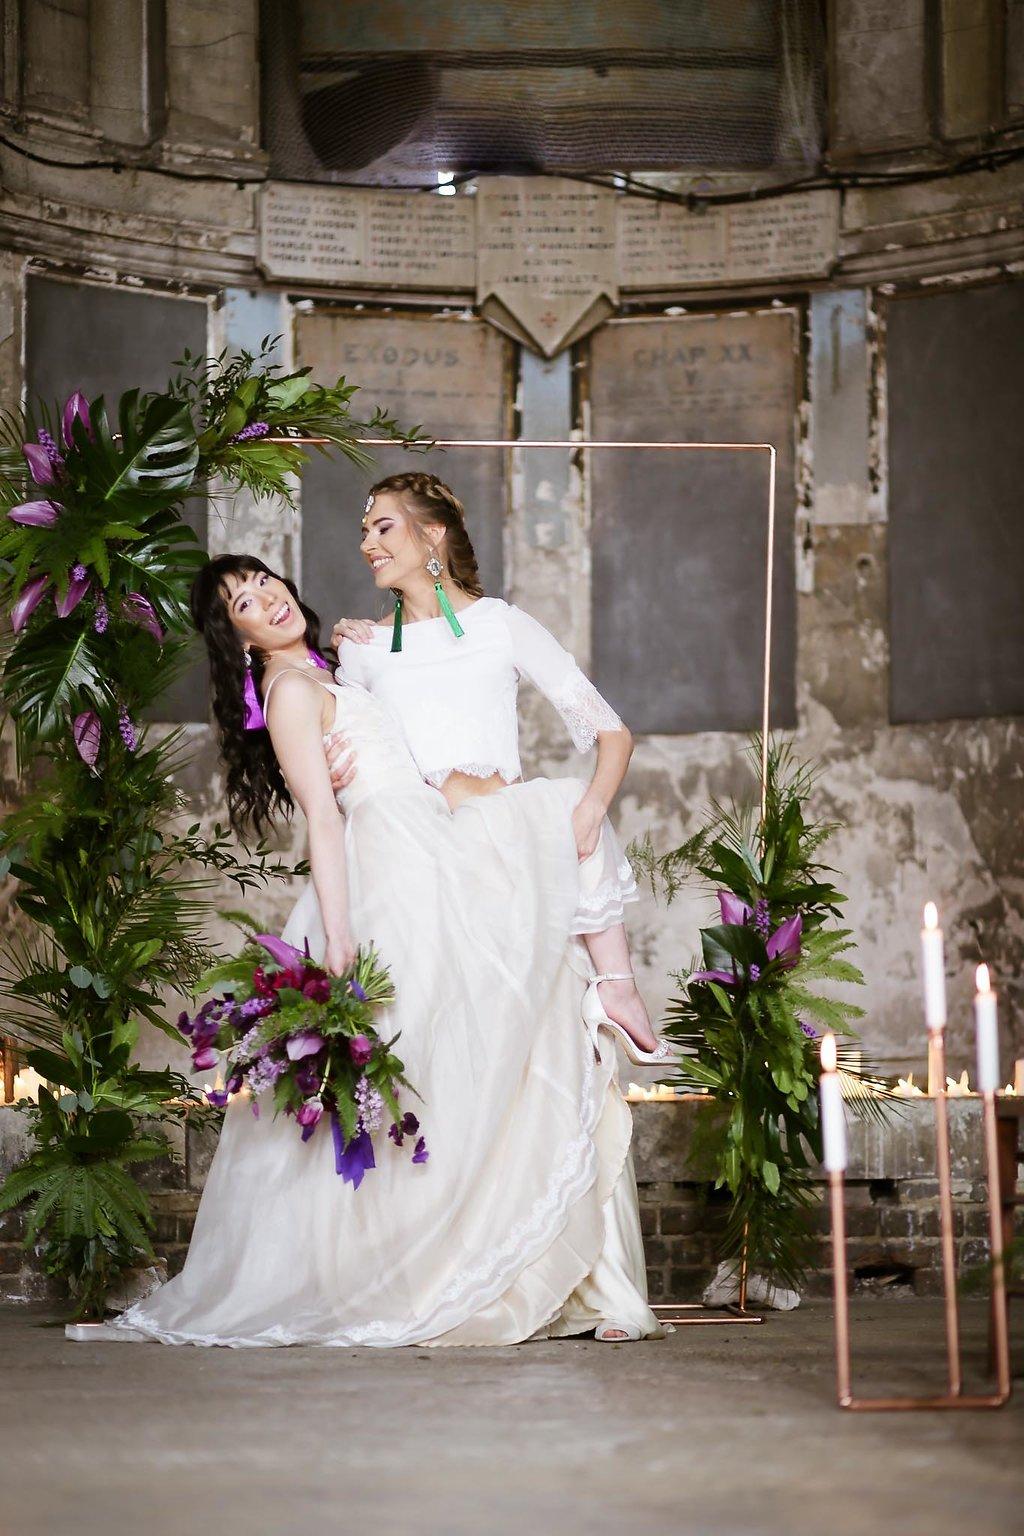 Rock the Purple Love - Gido Weddings - The Asylum Chapel - alternative wedding inspiration 107 - urban, modern wedding